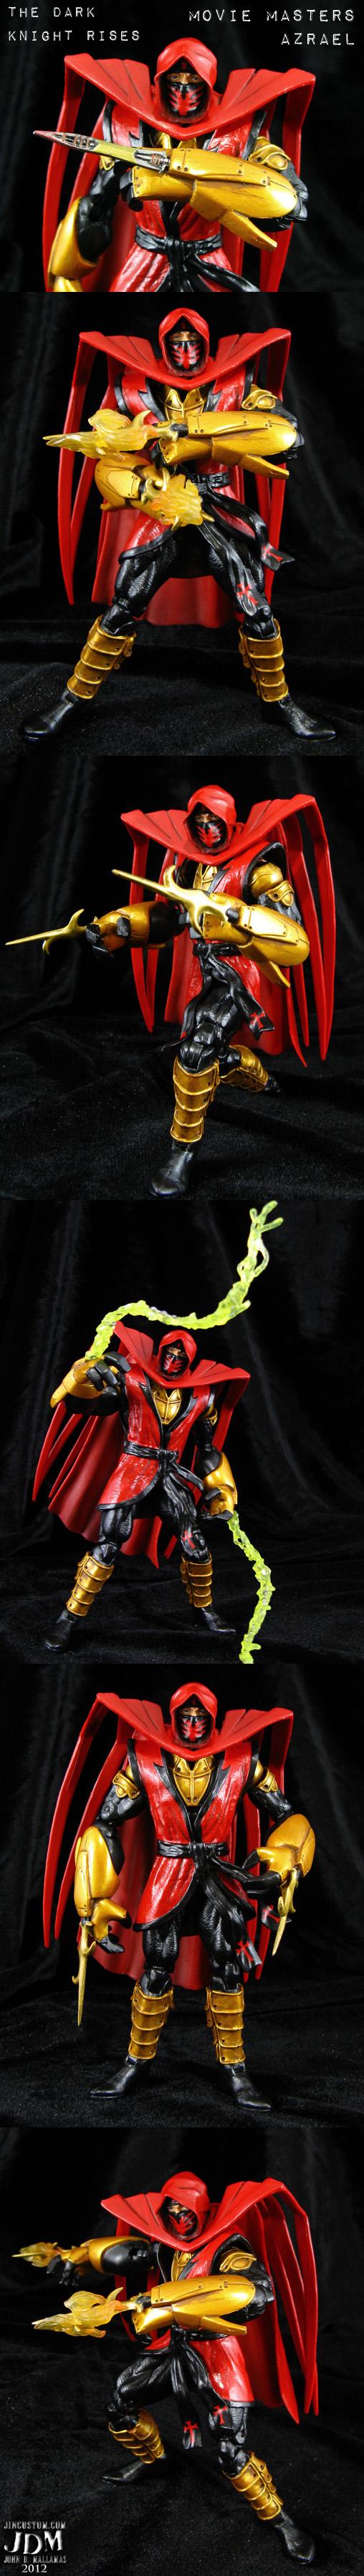 Custom Azrael batman figure